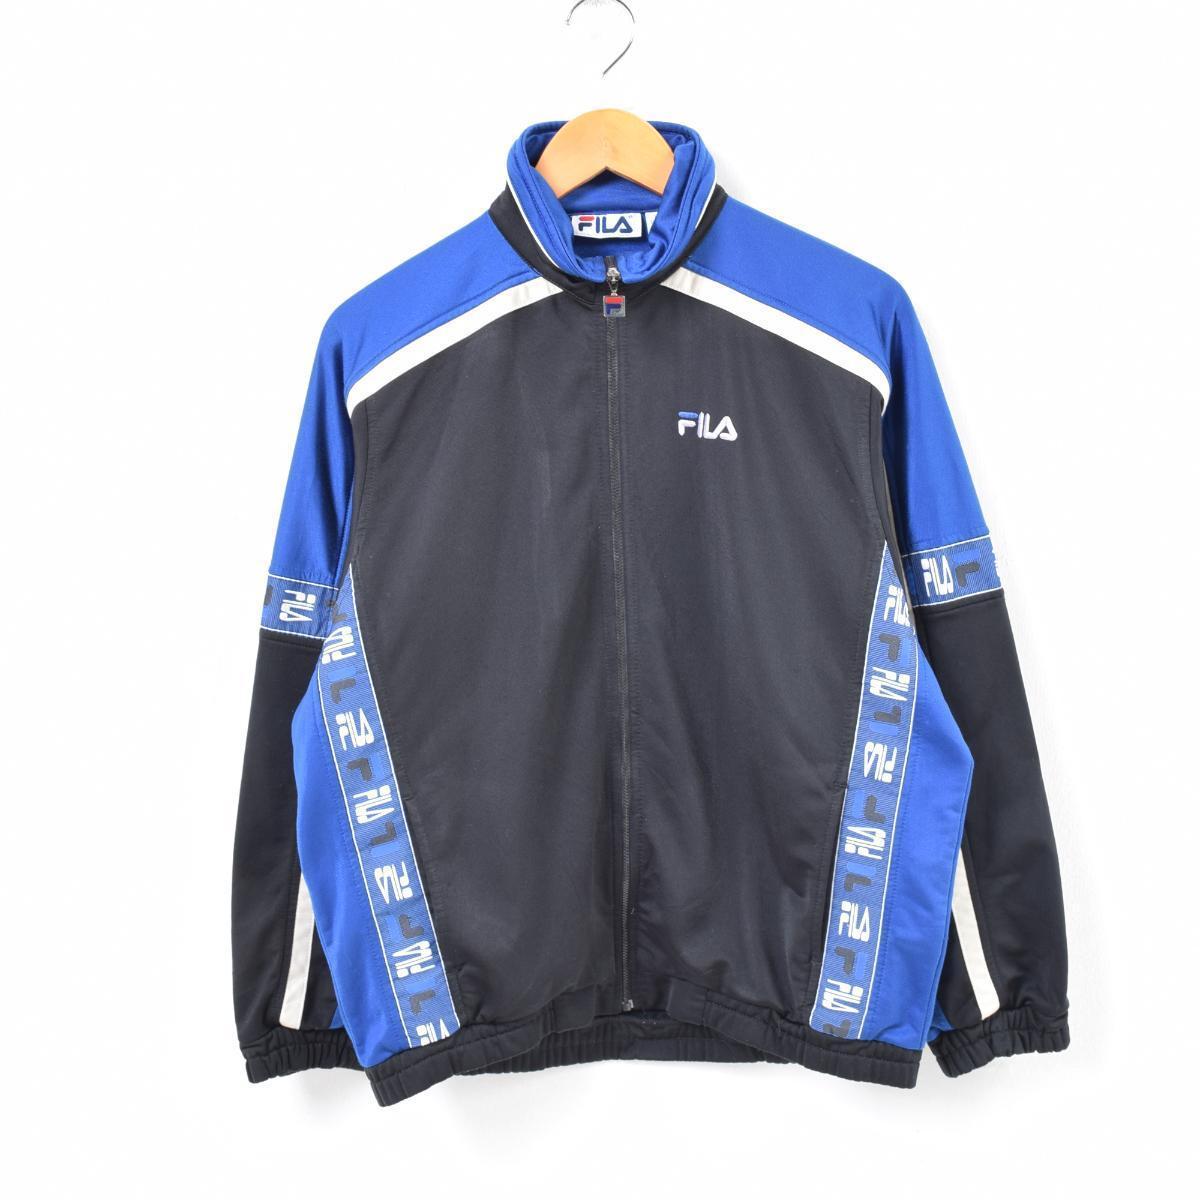 d883200b2b VINTAGE CLOTHING JAM  90s Fila FILA logo tape jersey truck jacket ...